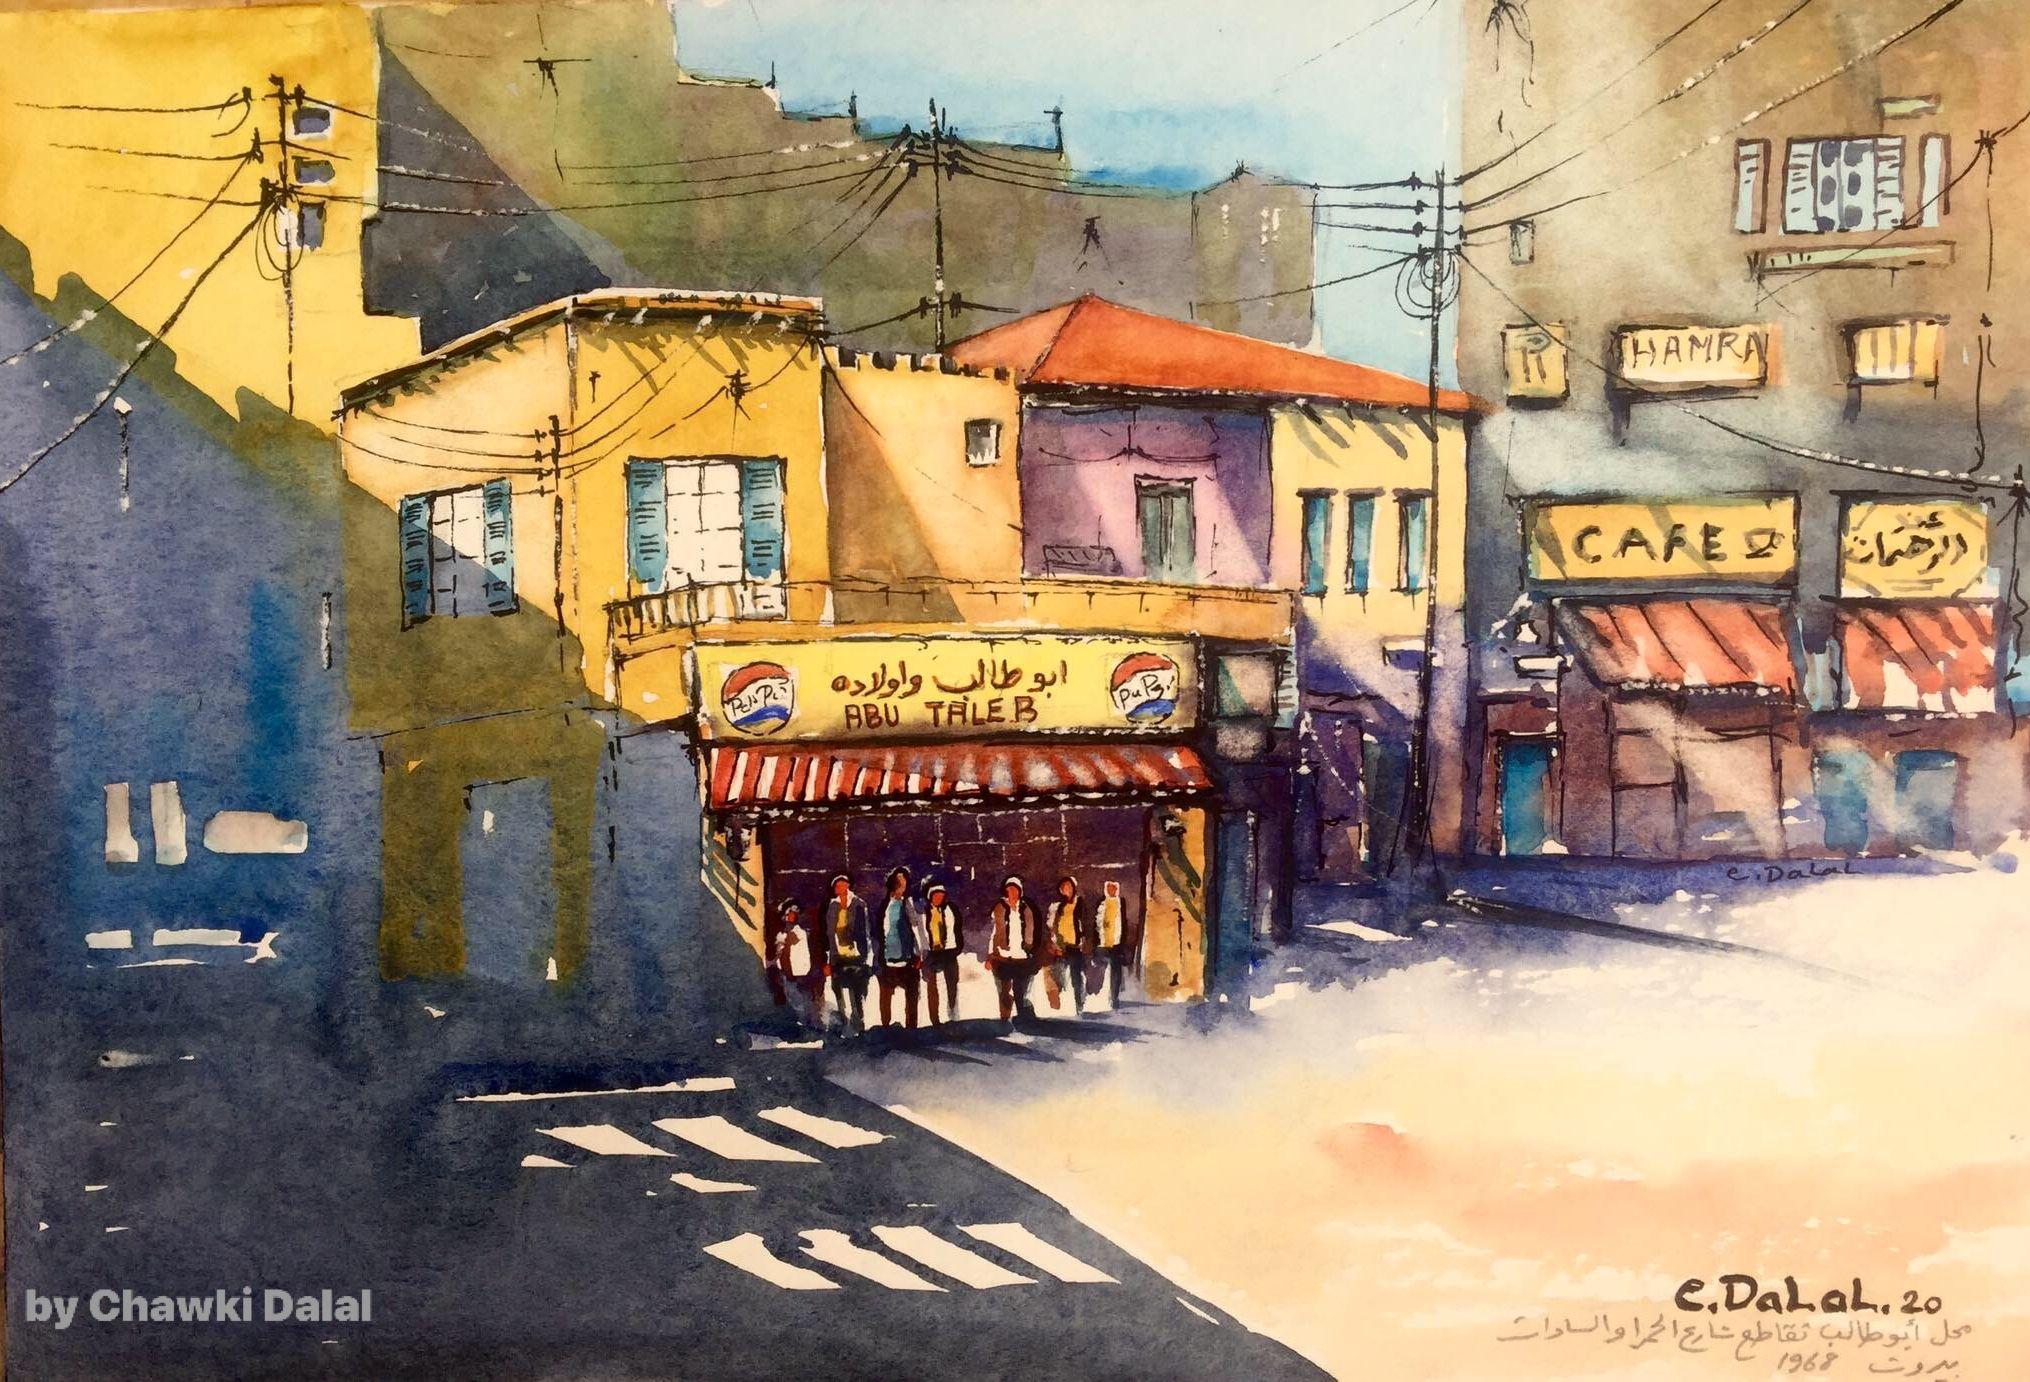 Watercolor Painting By Chawki Dalal From The Shop Of Abu Talib Al Hamra Street Beirut Lebanon Year 1968 لوحة جديدة بريشتي من أمام محل أبو Art Painting